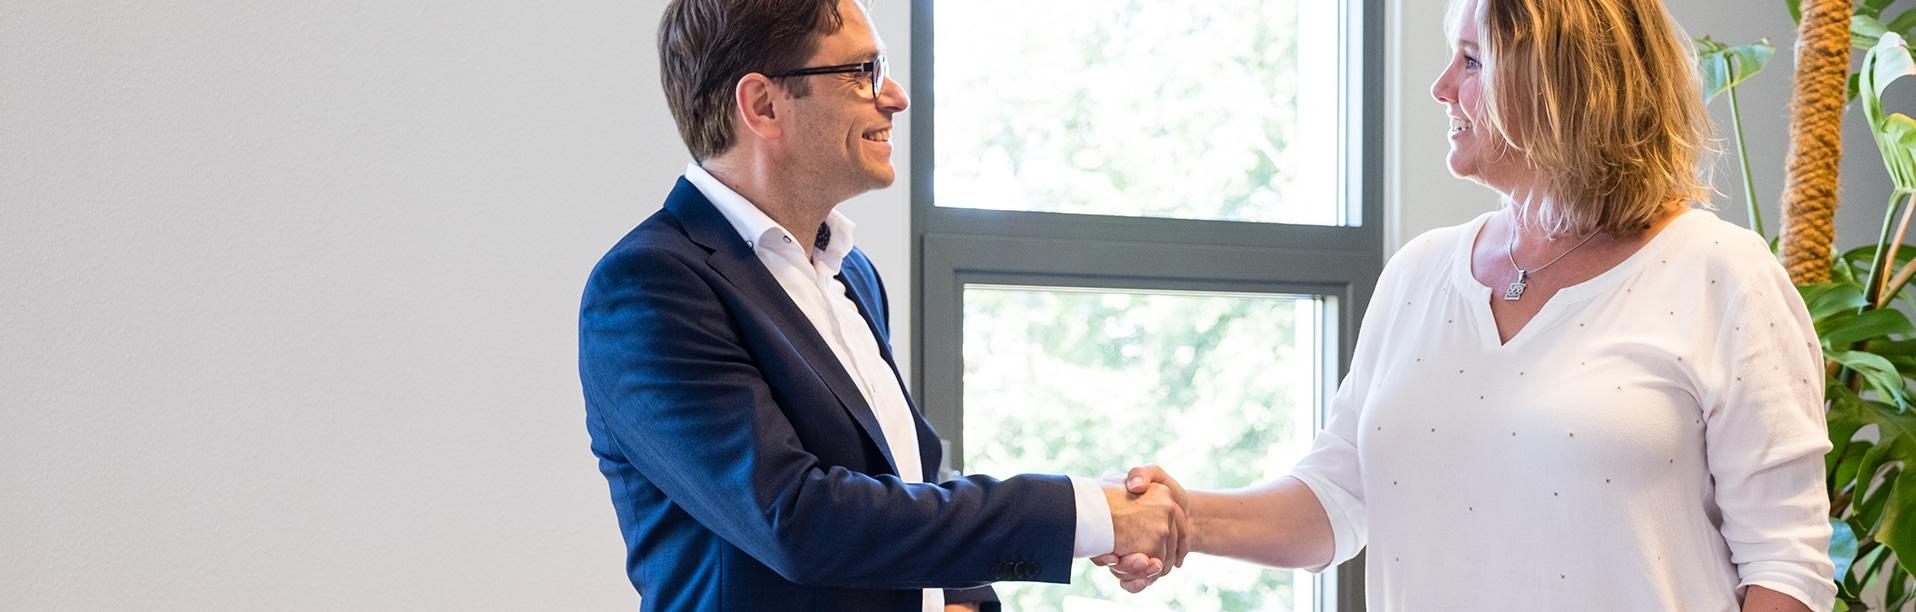 plan van aanpak accountmanager Accountmanager Zuid Nederland   Lean Six Sigma trainingen ✓ Symbol plan van aanpak accountmanager